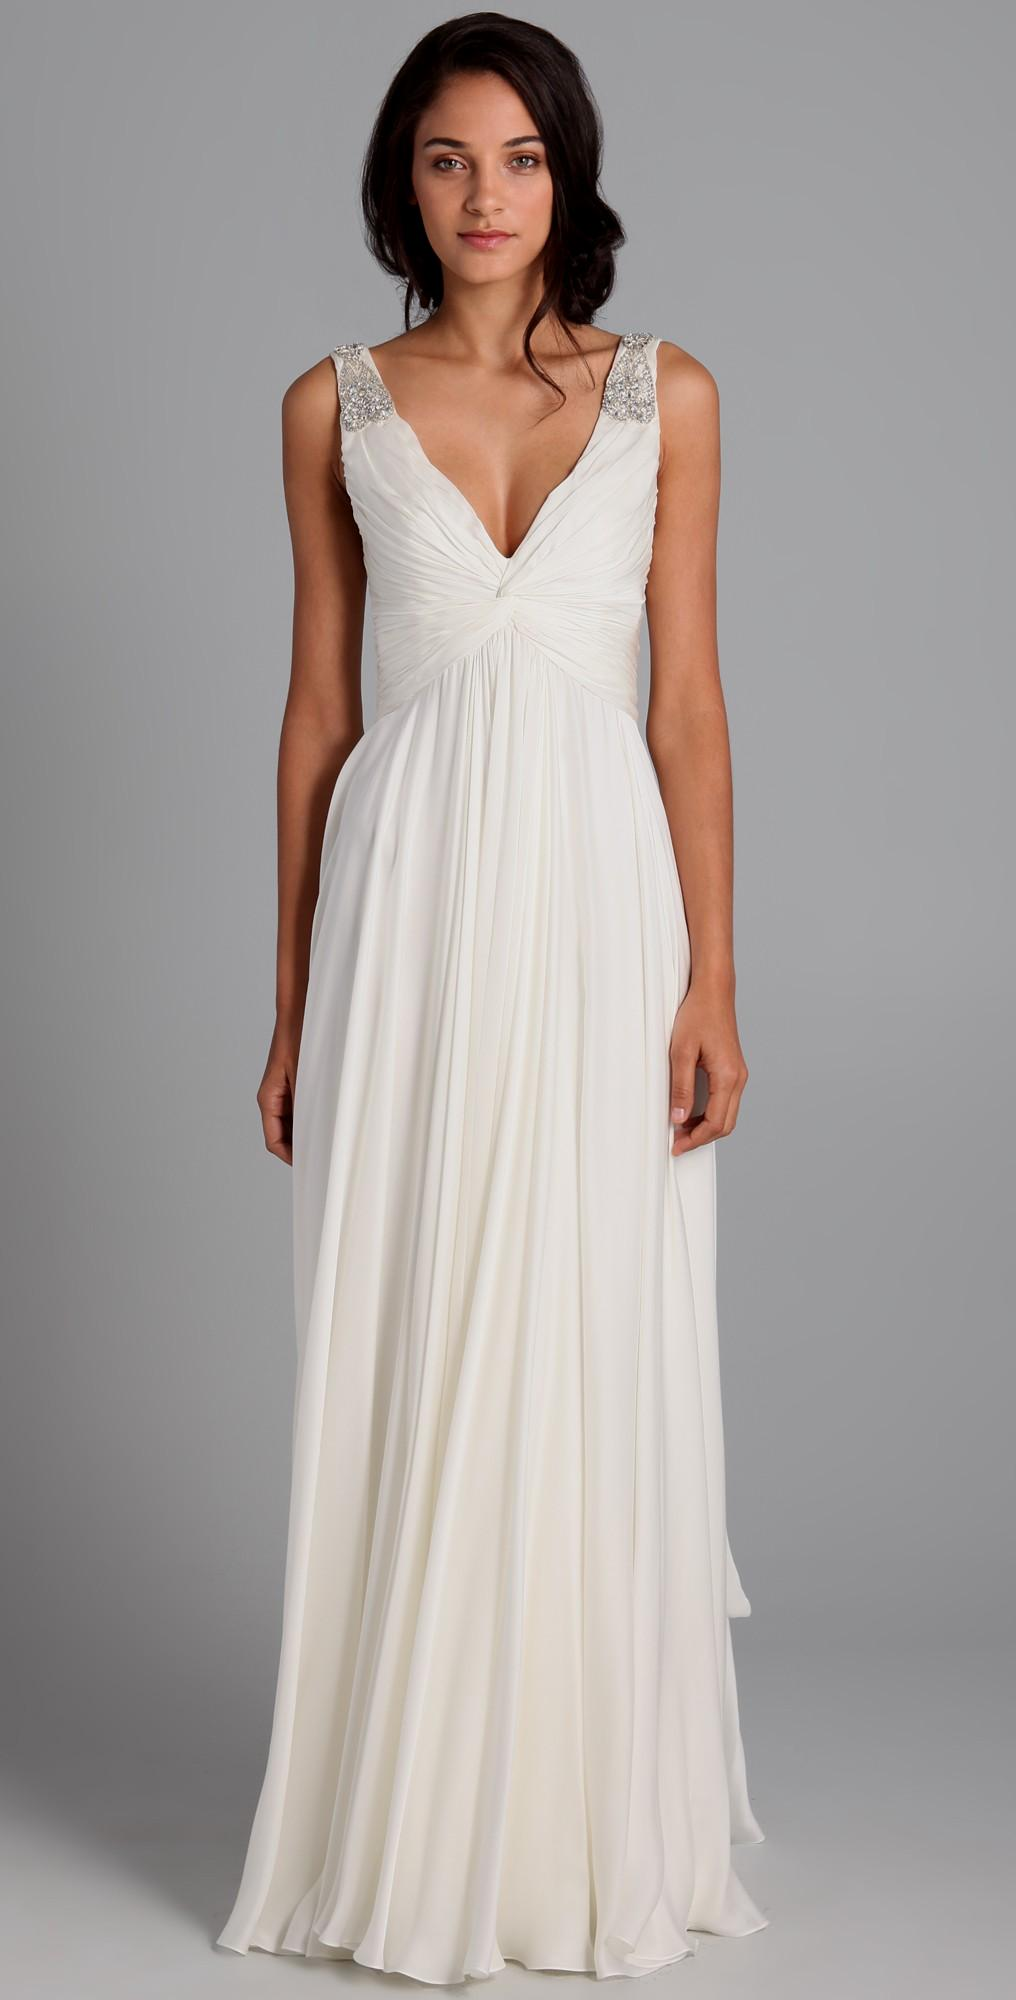 casual cotton wedding dresses photo - 1